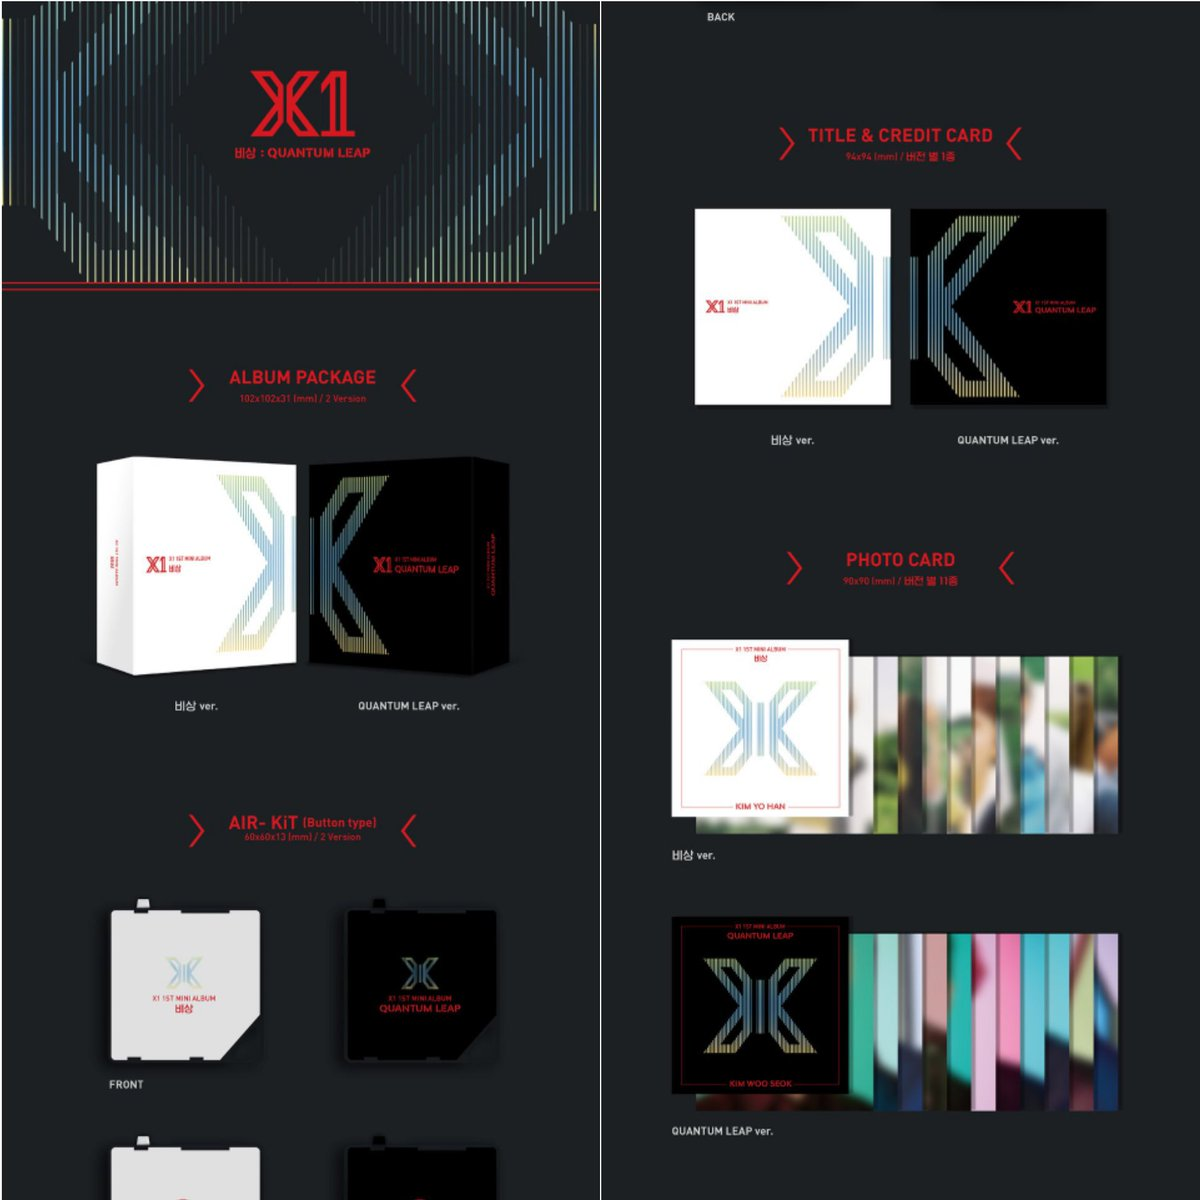 Lizziekpop Kpop Shop On Twitter Po X1 비상 Quantum Leap 비상 Quantum Leap Kihno Album 395 000